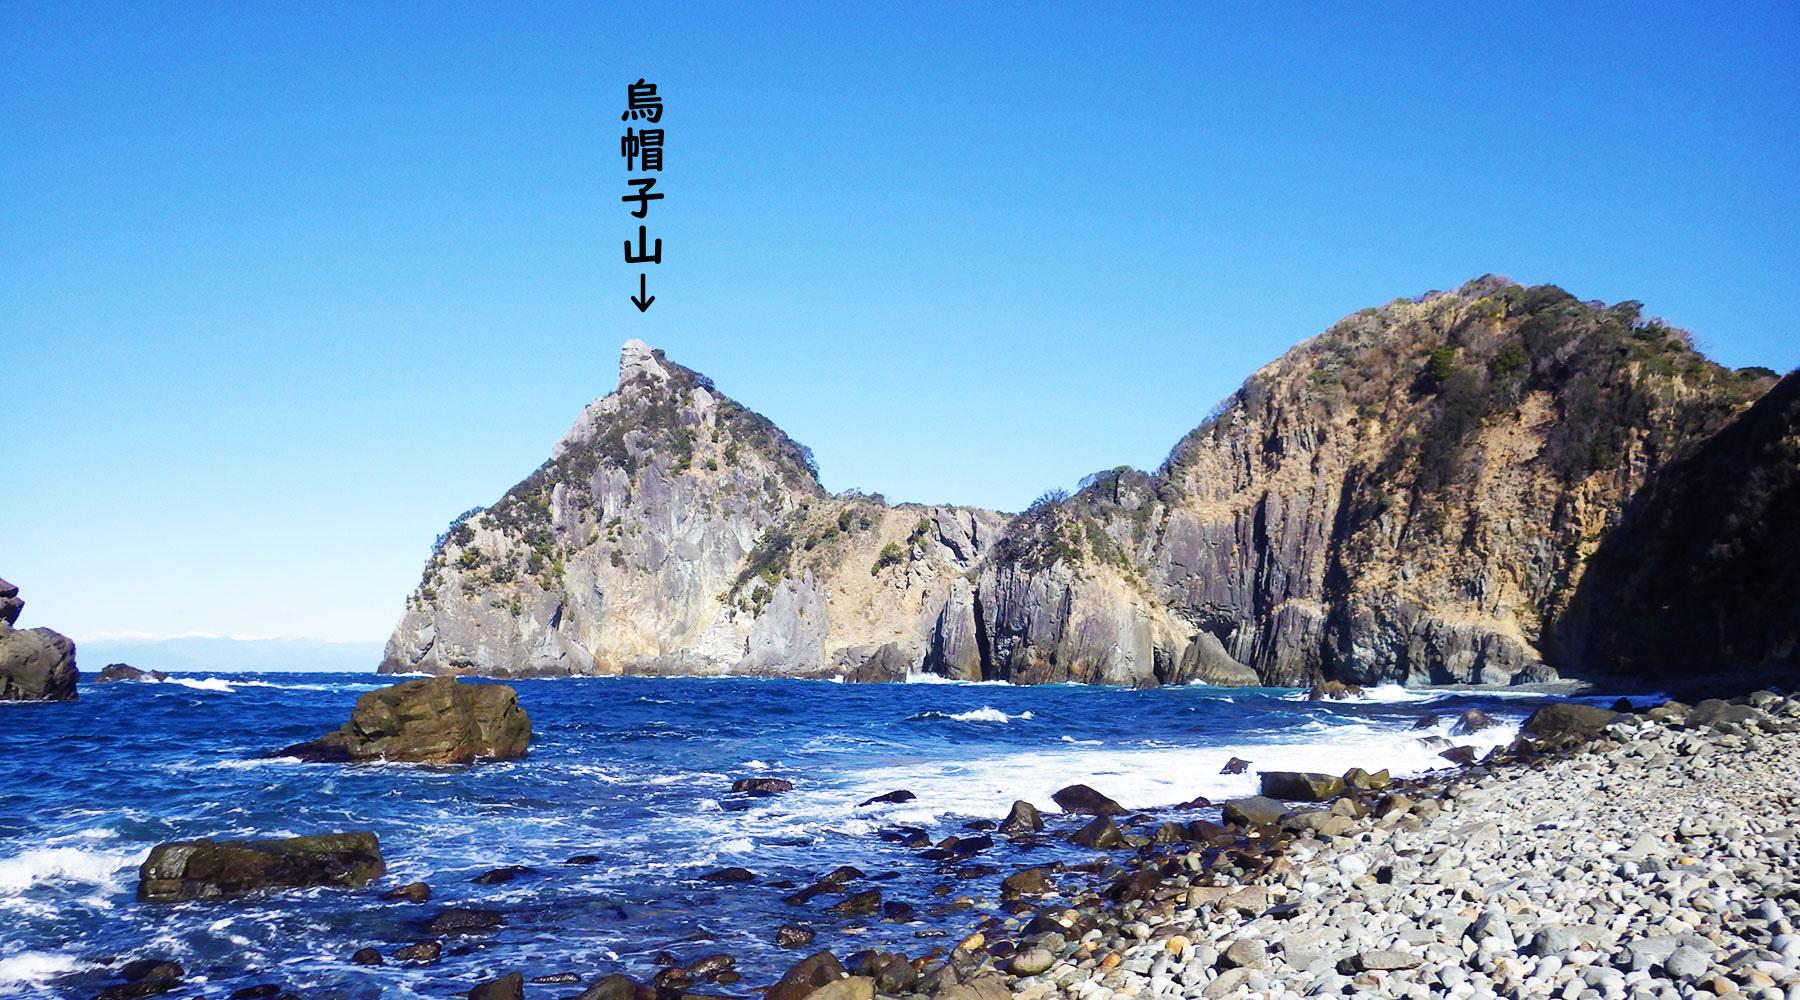 千貫門から見た烏帽子山(雲見浅間神社本殿)